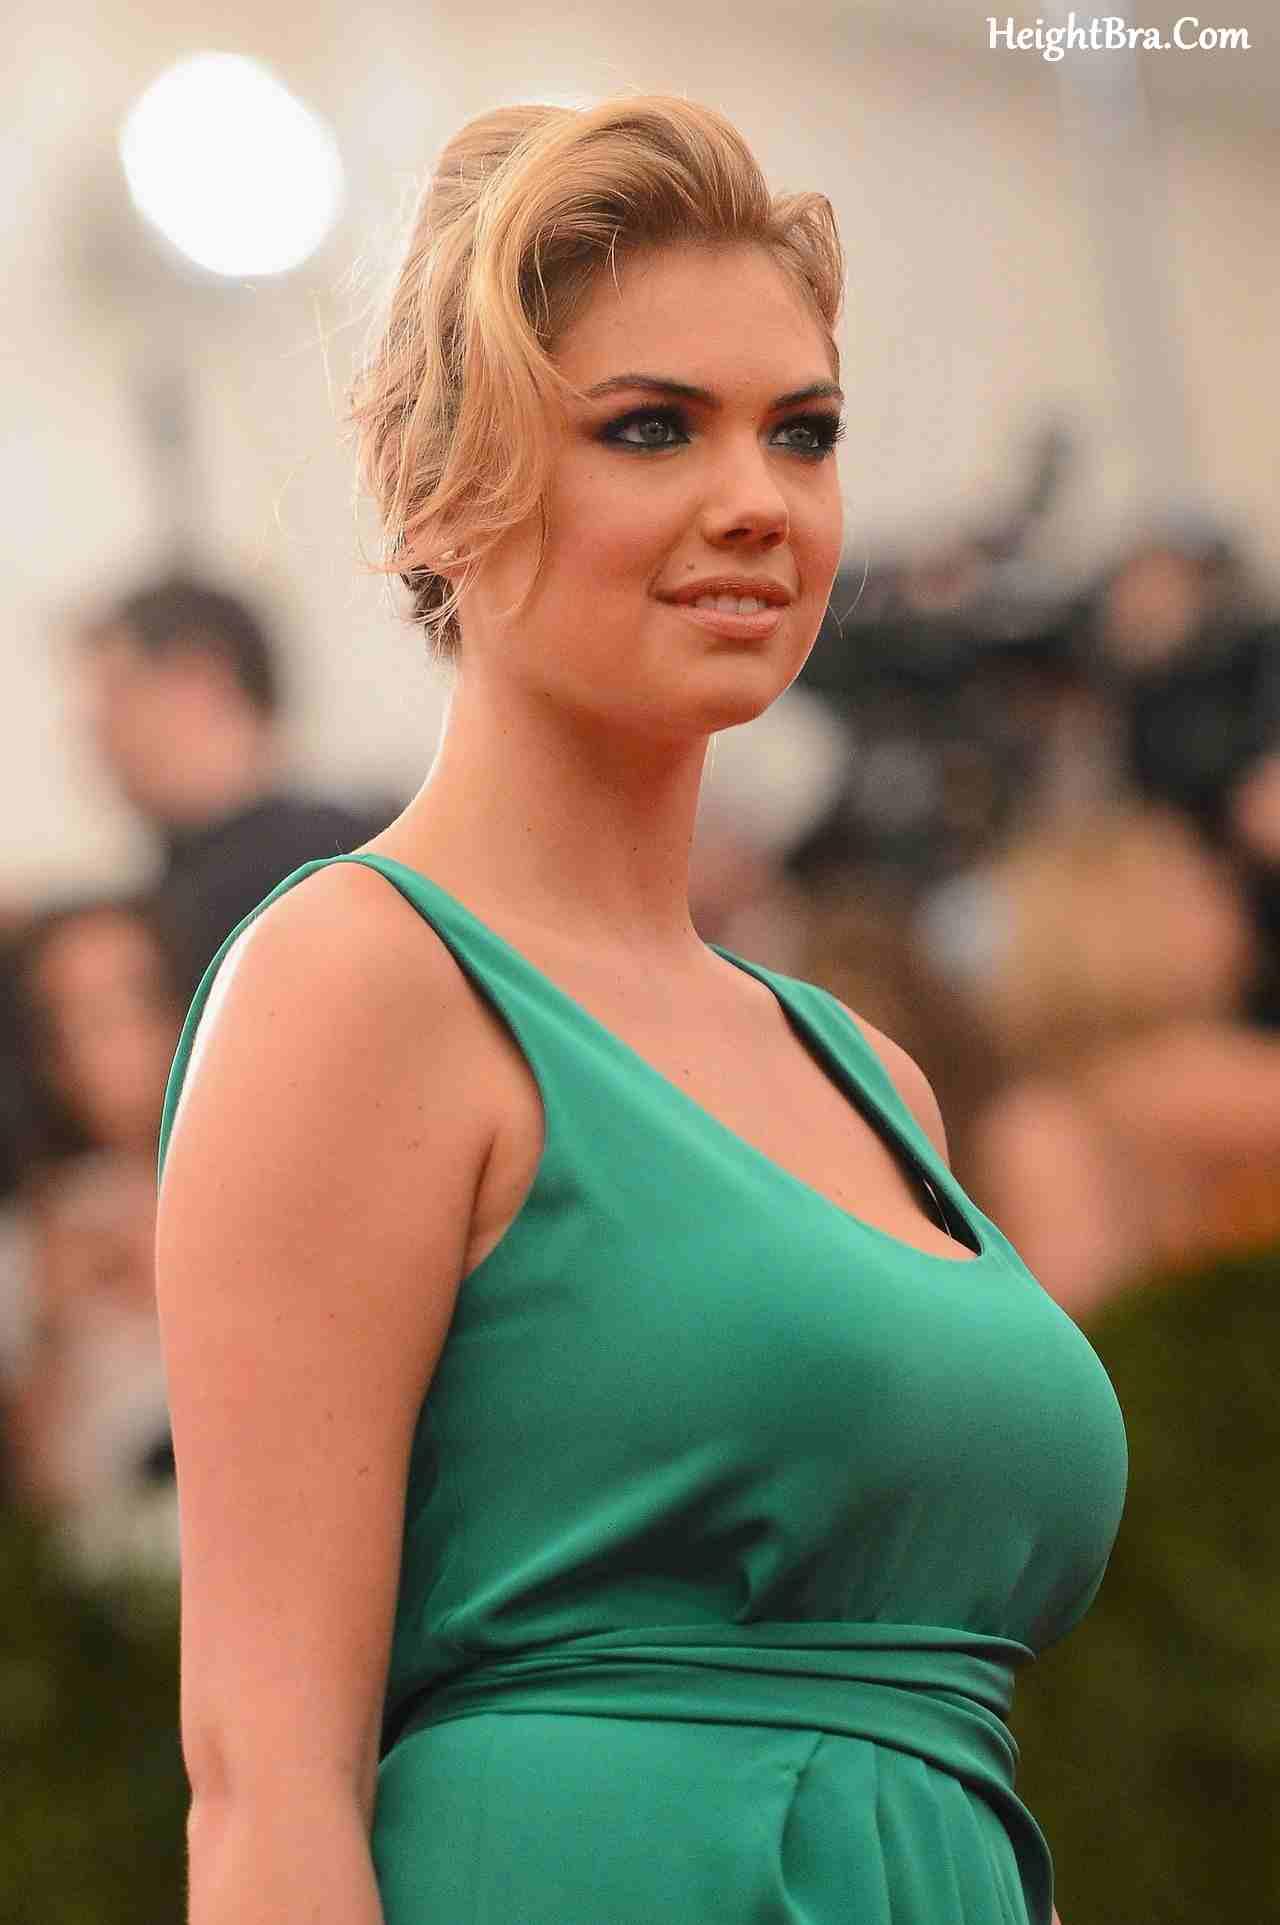 Kate Upton Height, Weight, Bra, Bio, Figure Size